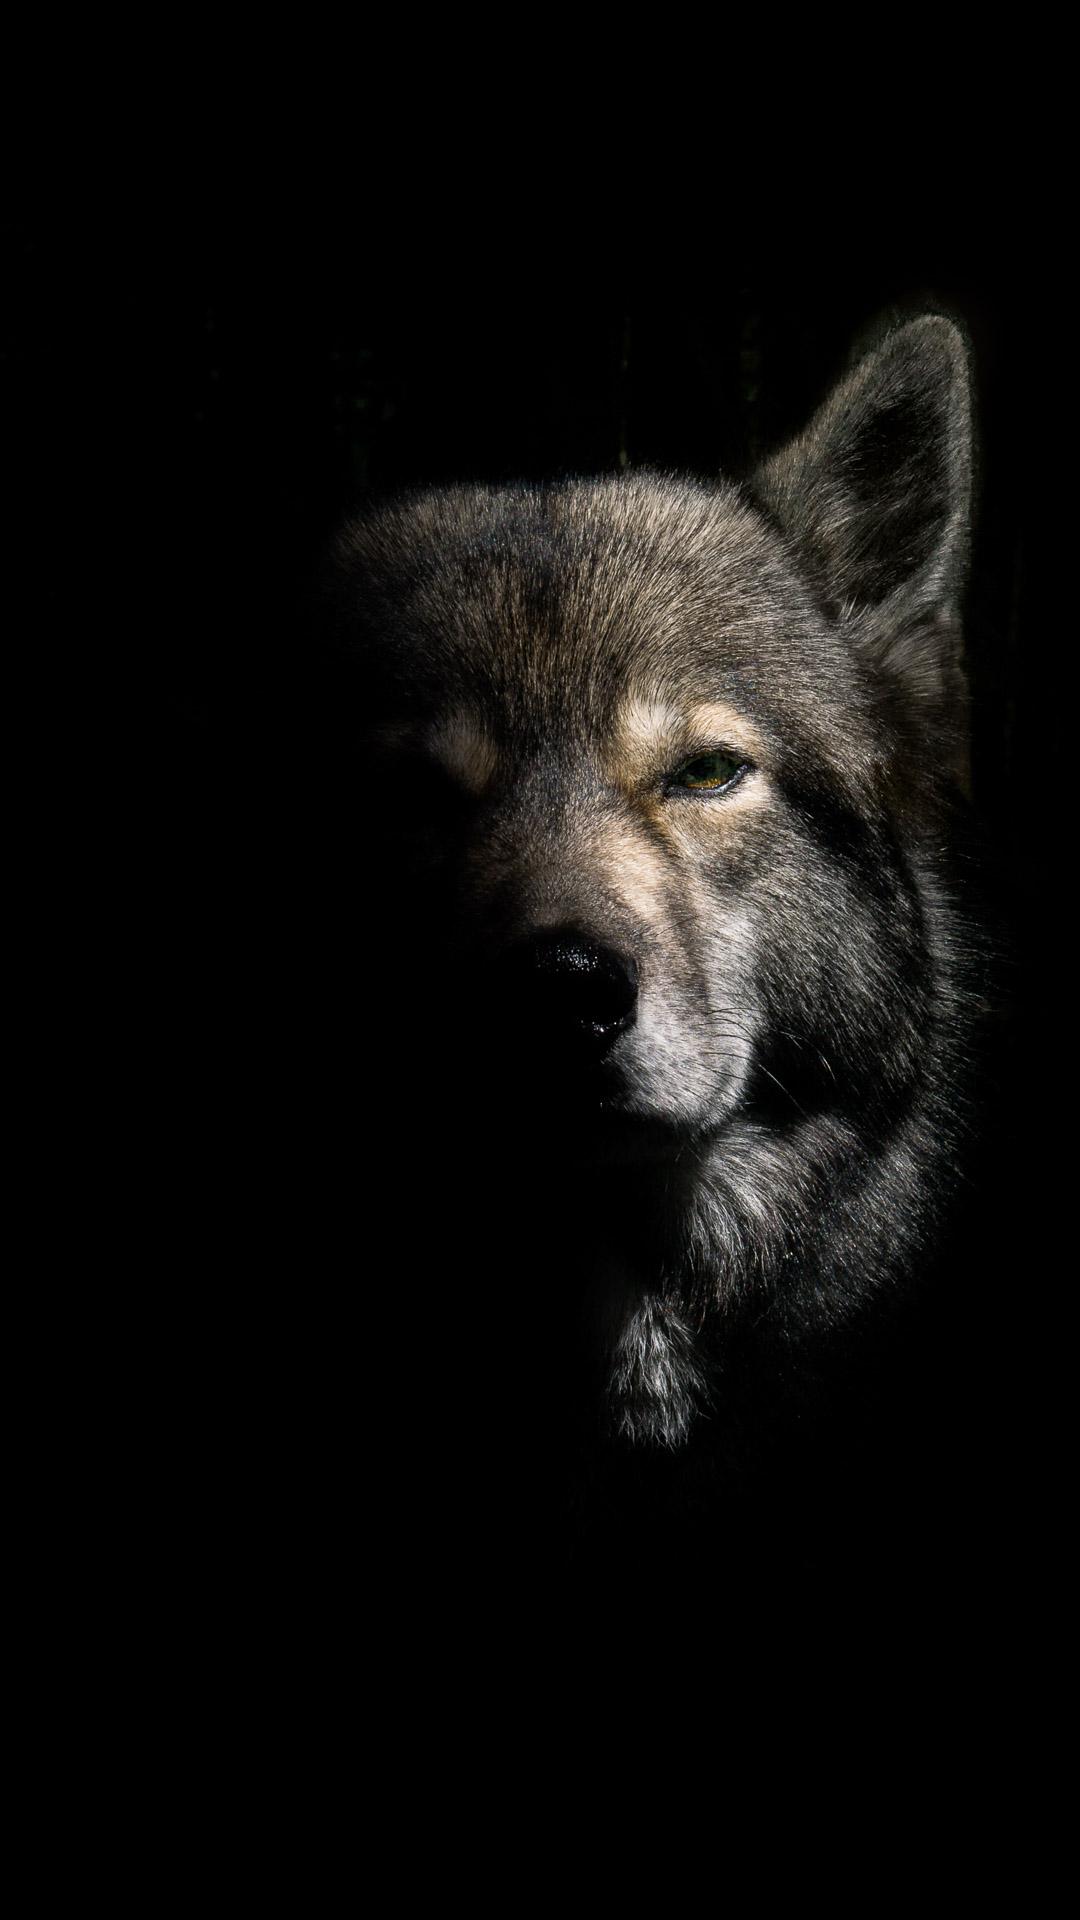 Wolf Phone Wallpaper - 1080x1920 ...